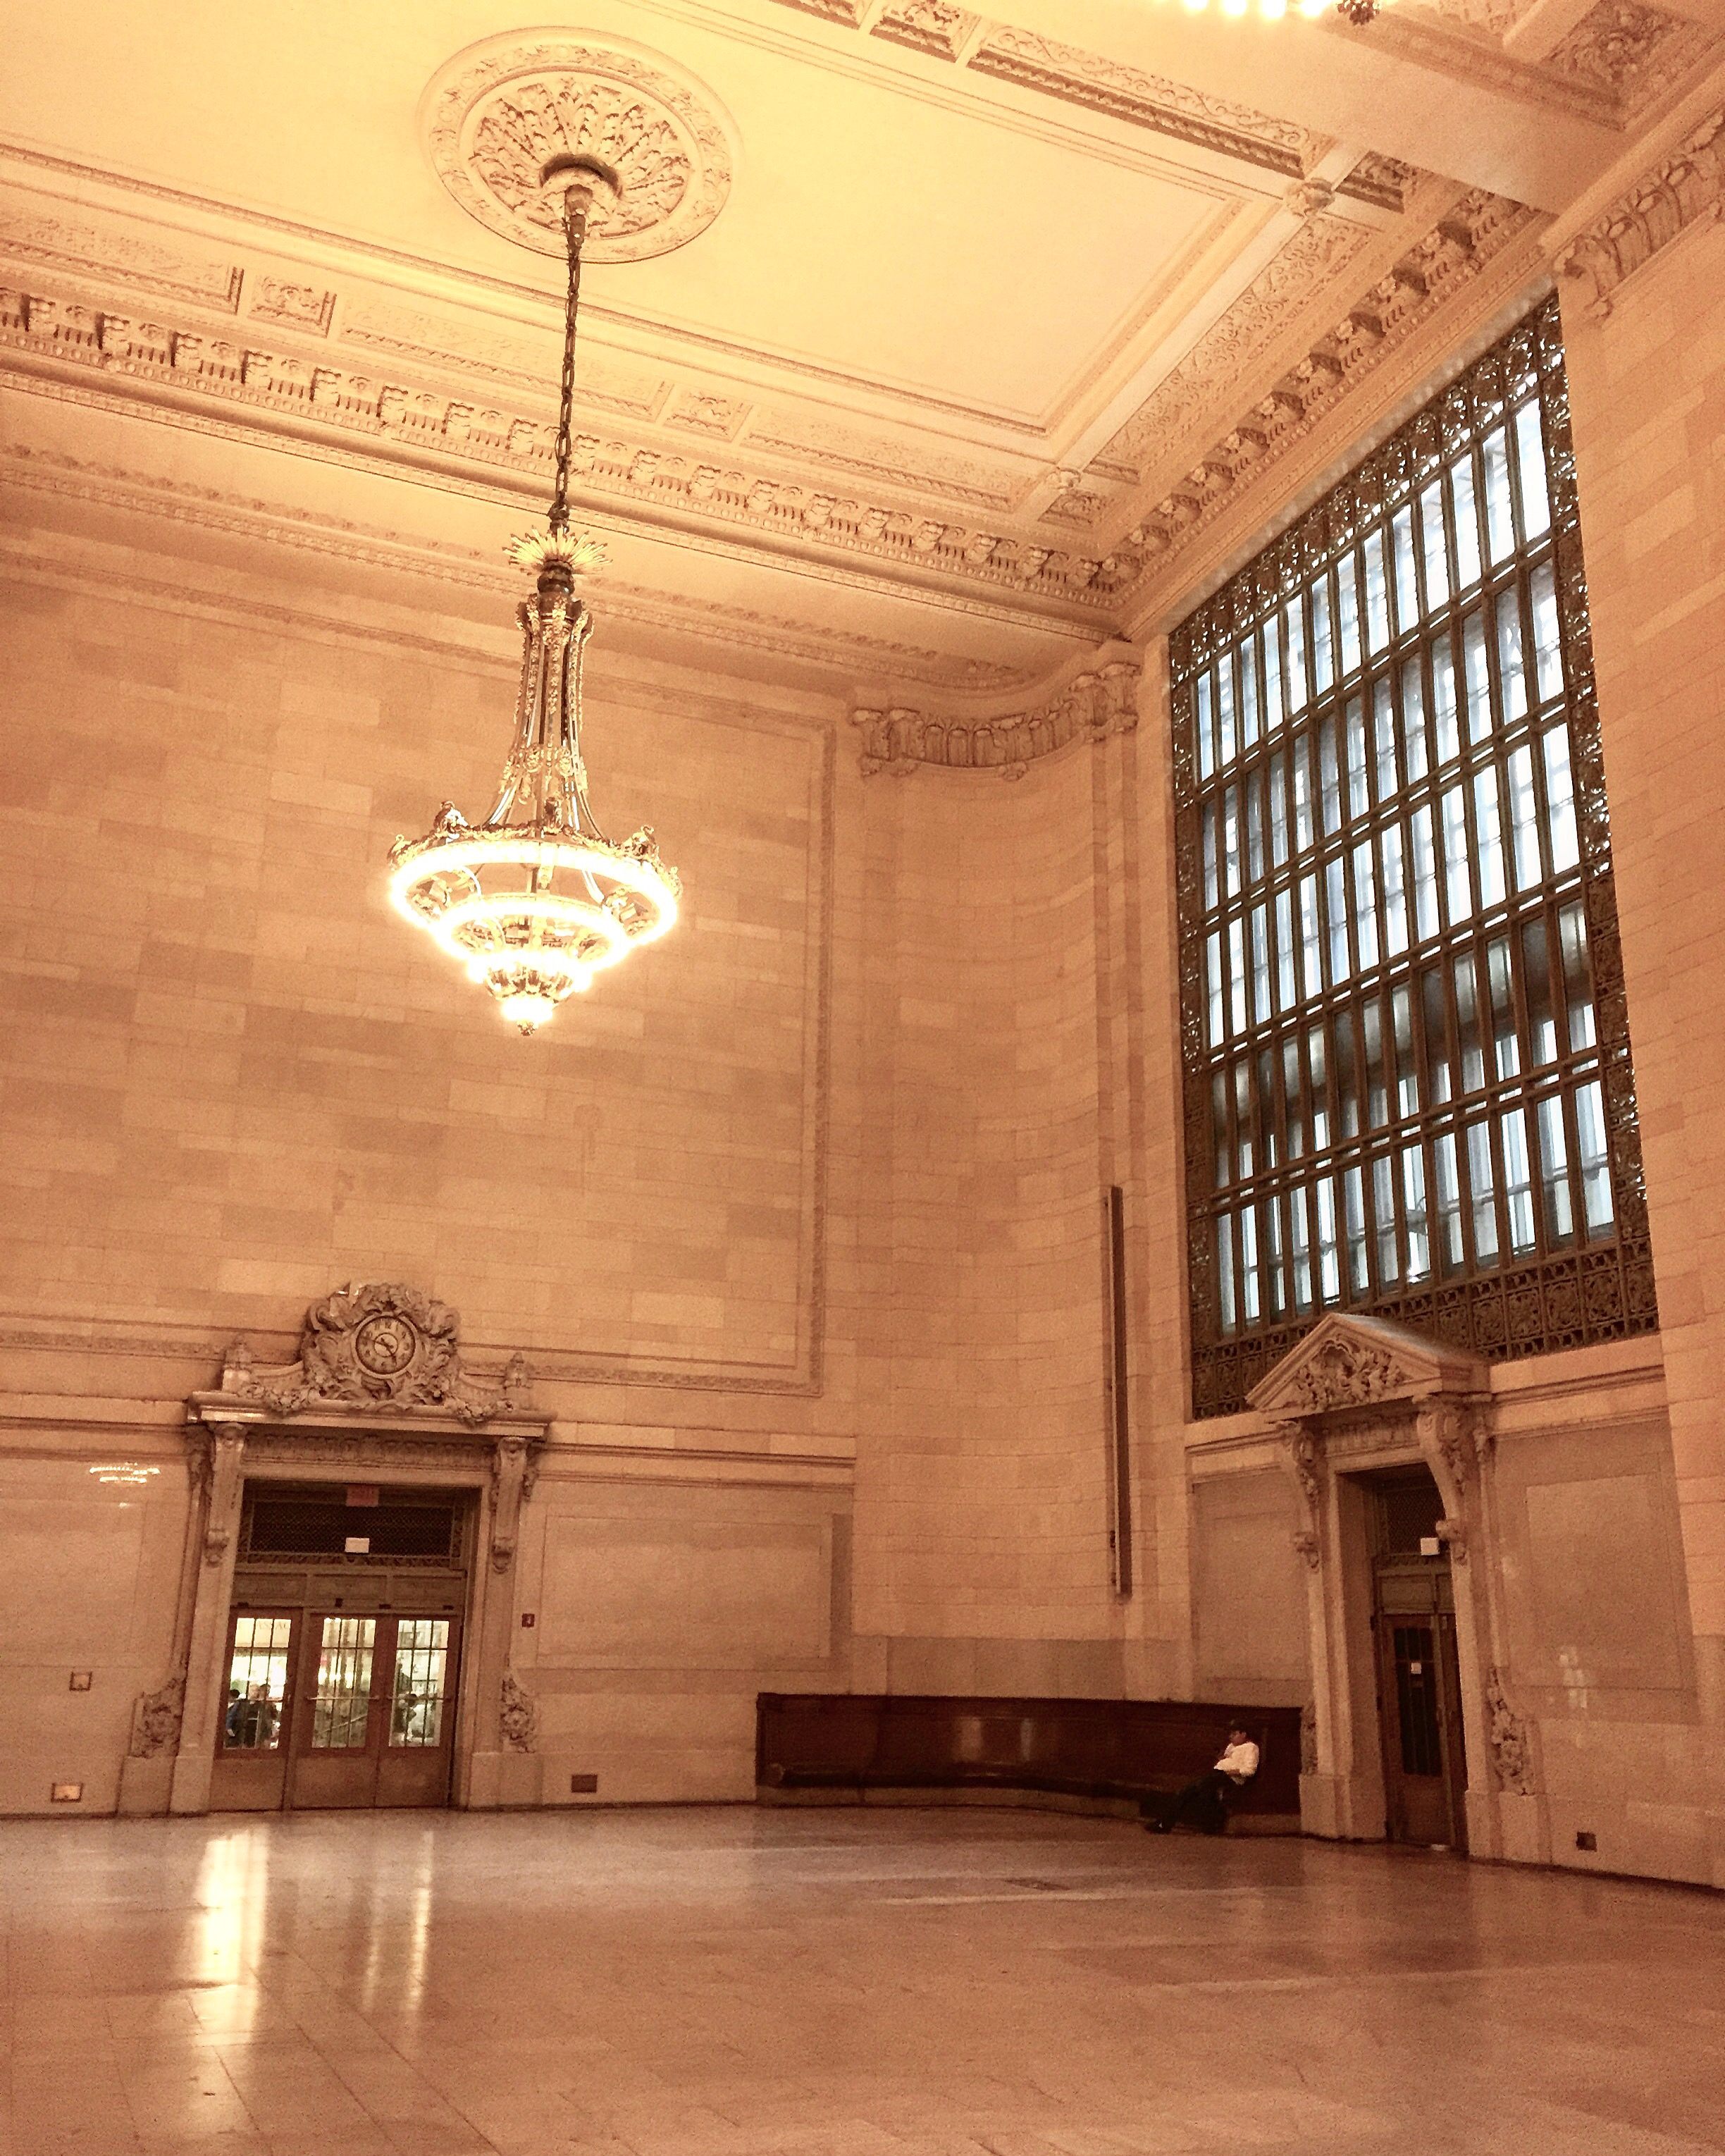 ROSE & IVY Journal Grand Central Station